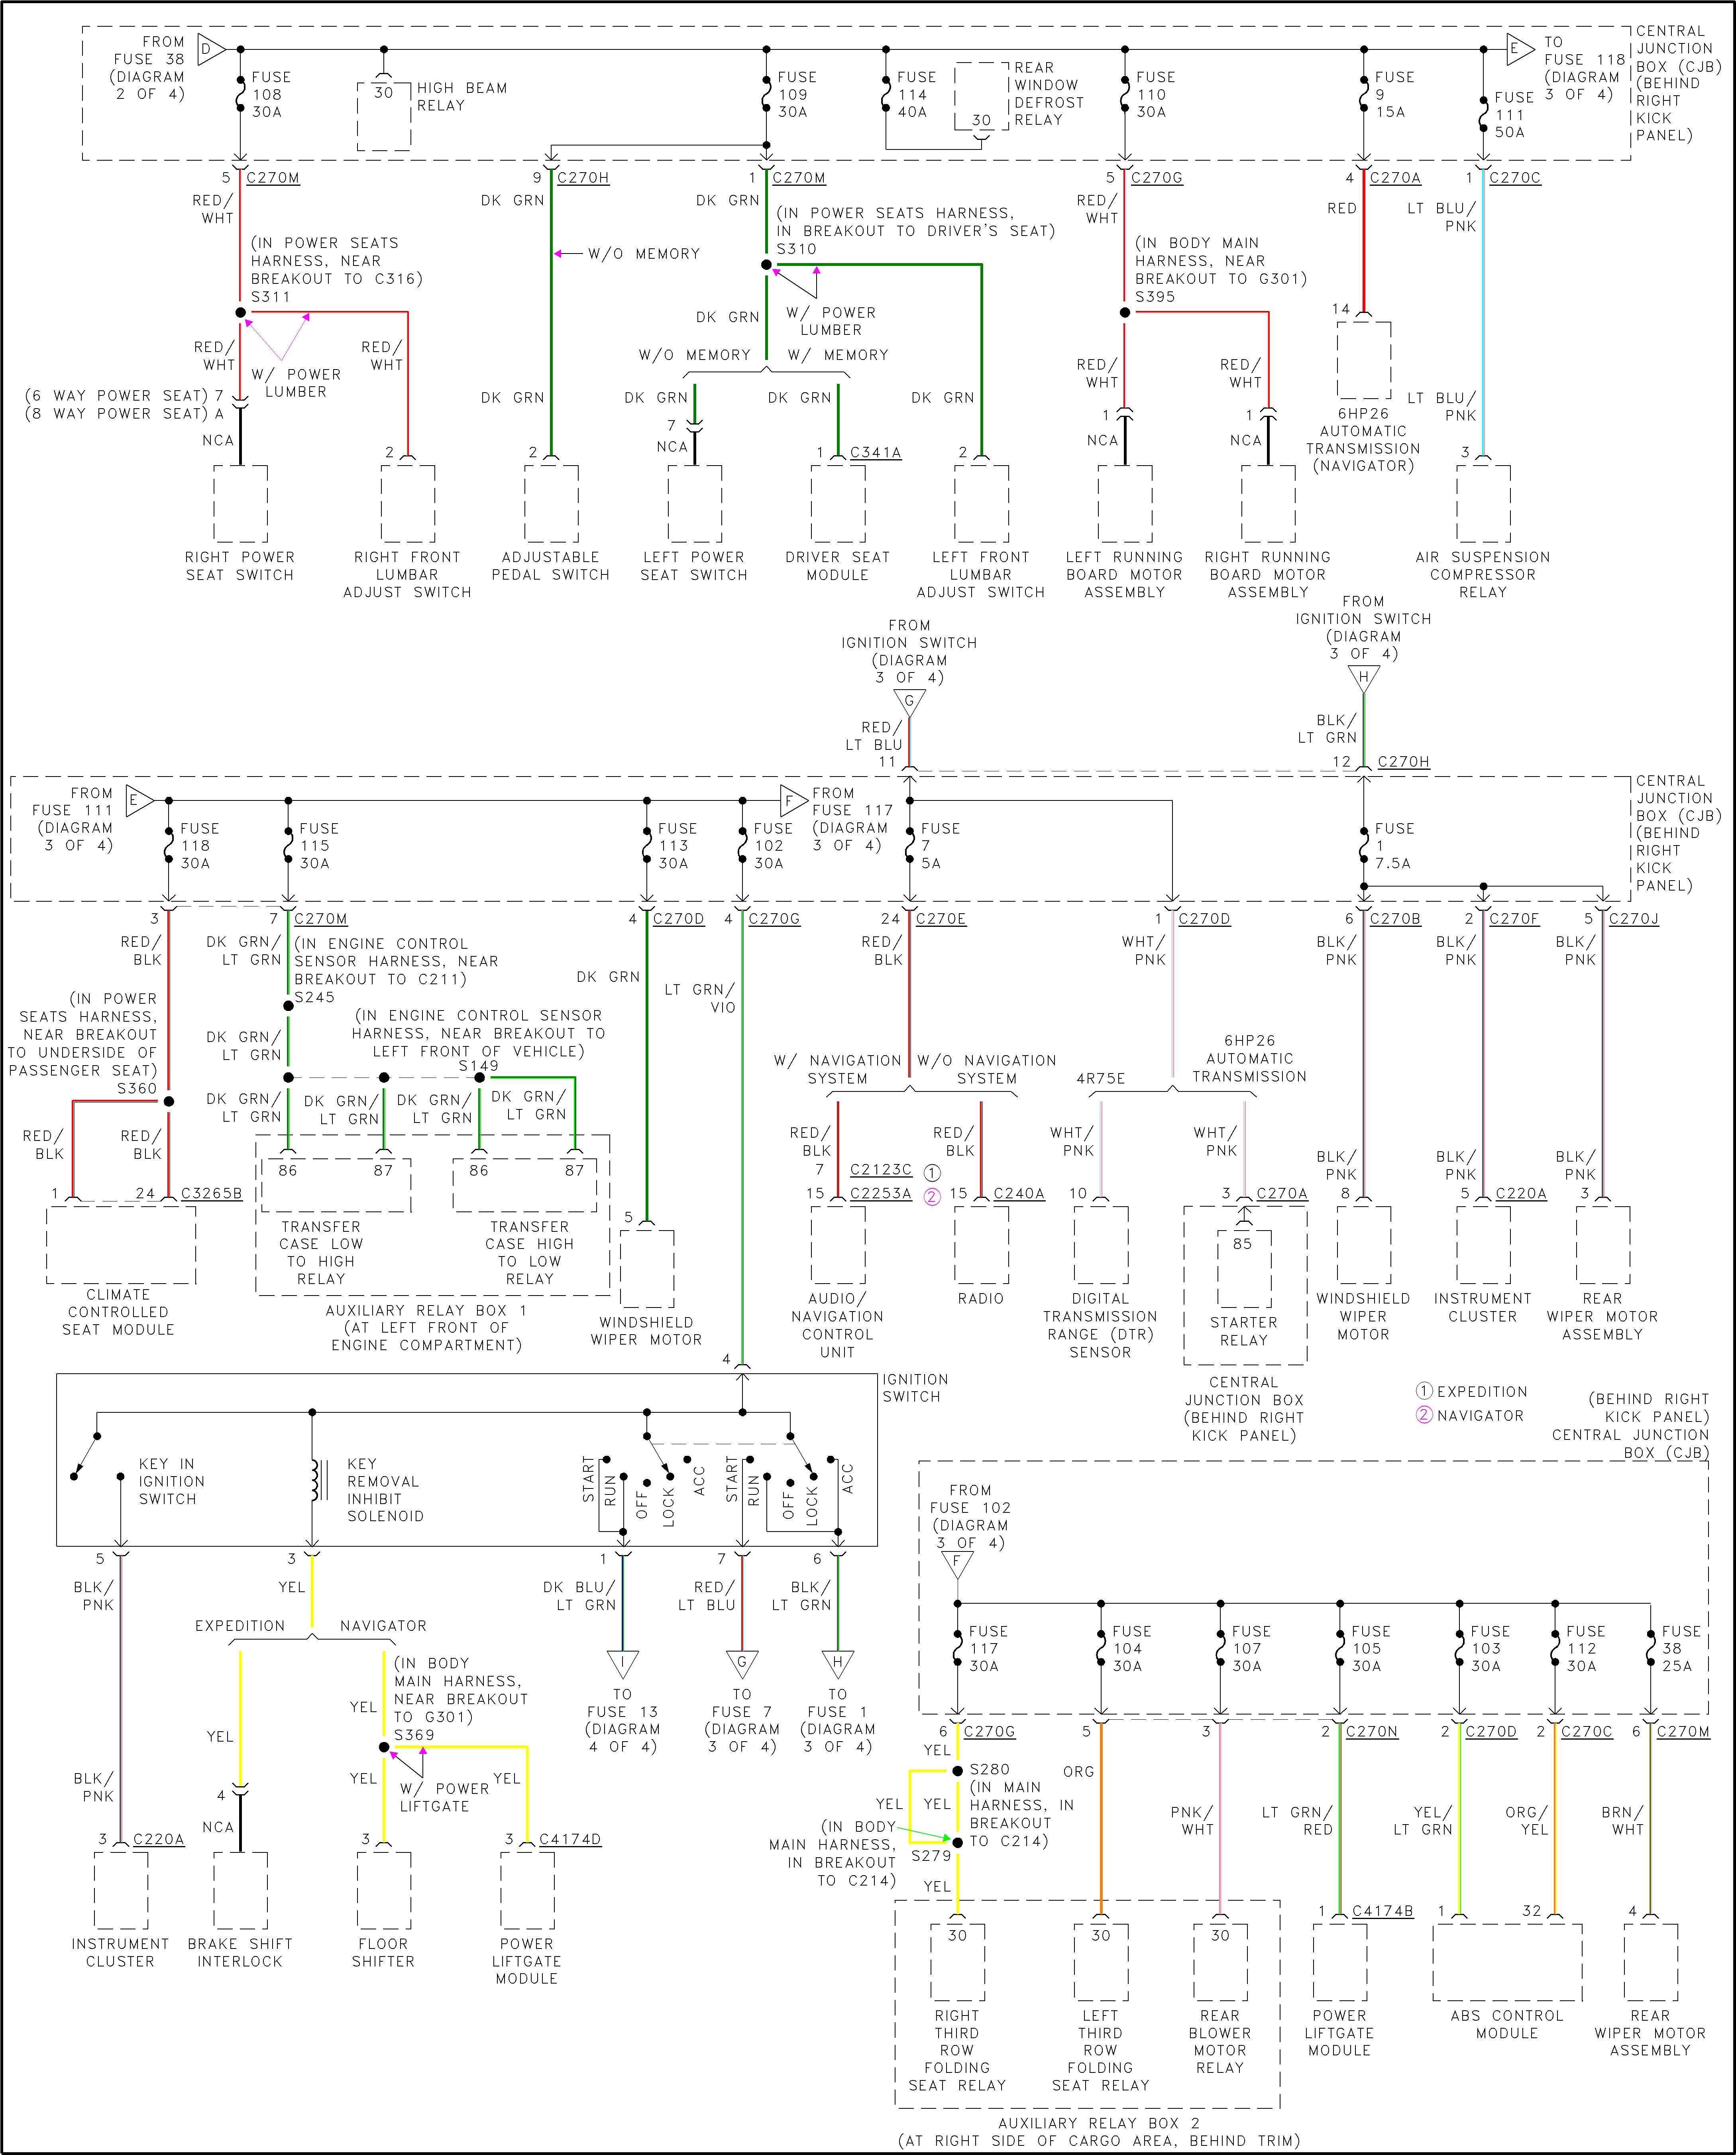 6dc1b162-cbe1-4b13-a085-2caf7fe3db57_3.png